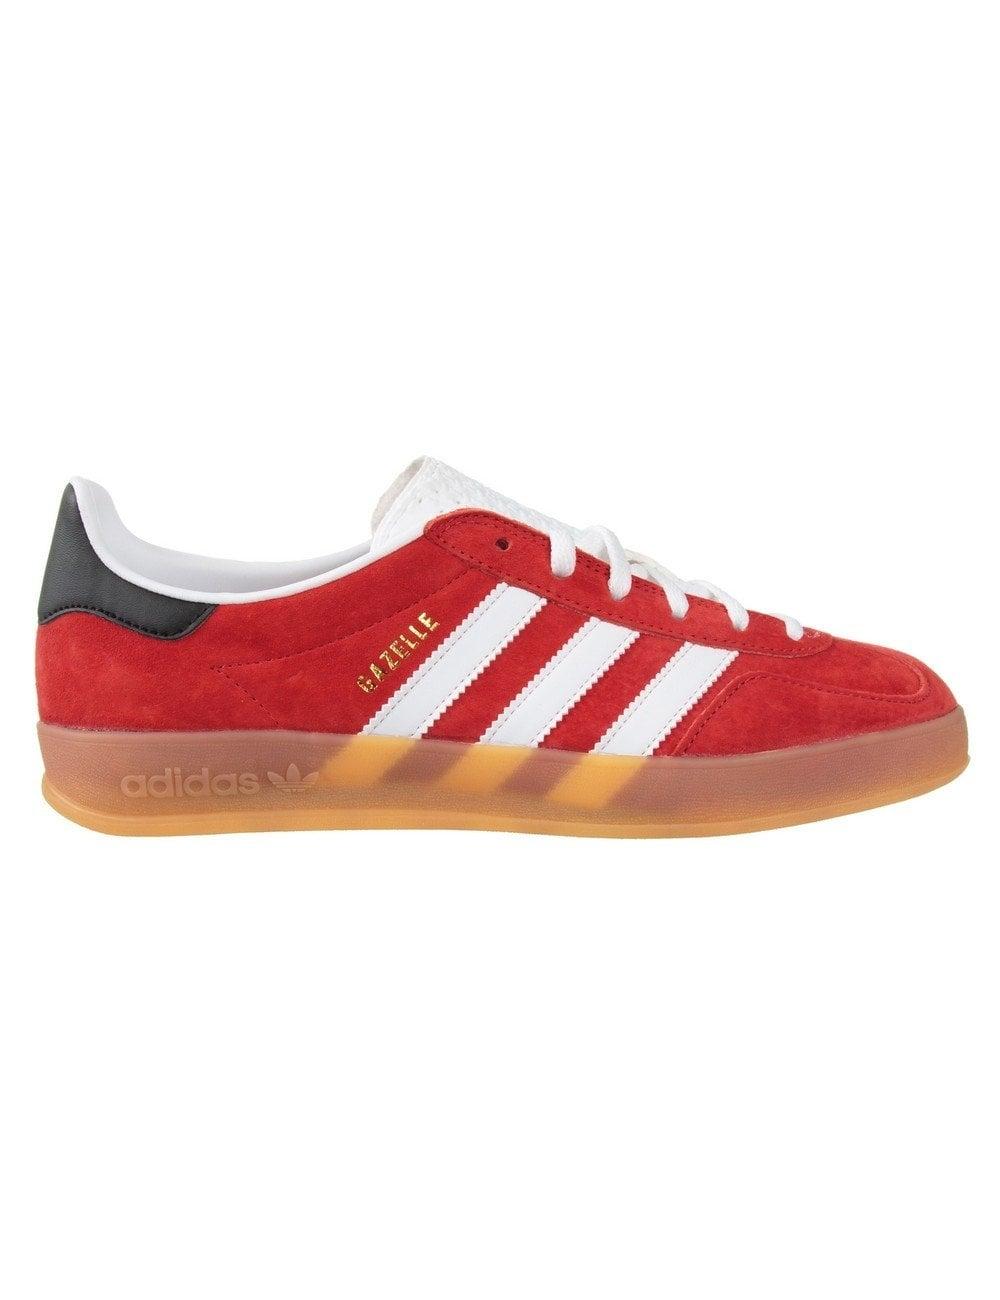 Originals Gazelle Indoor Footwear Redwhite Shoes From Adidas 7xzdwHq5H